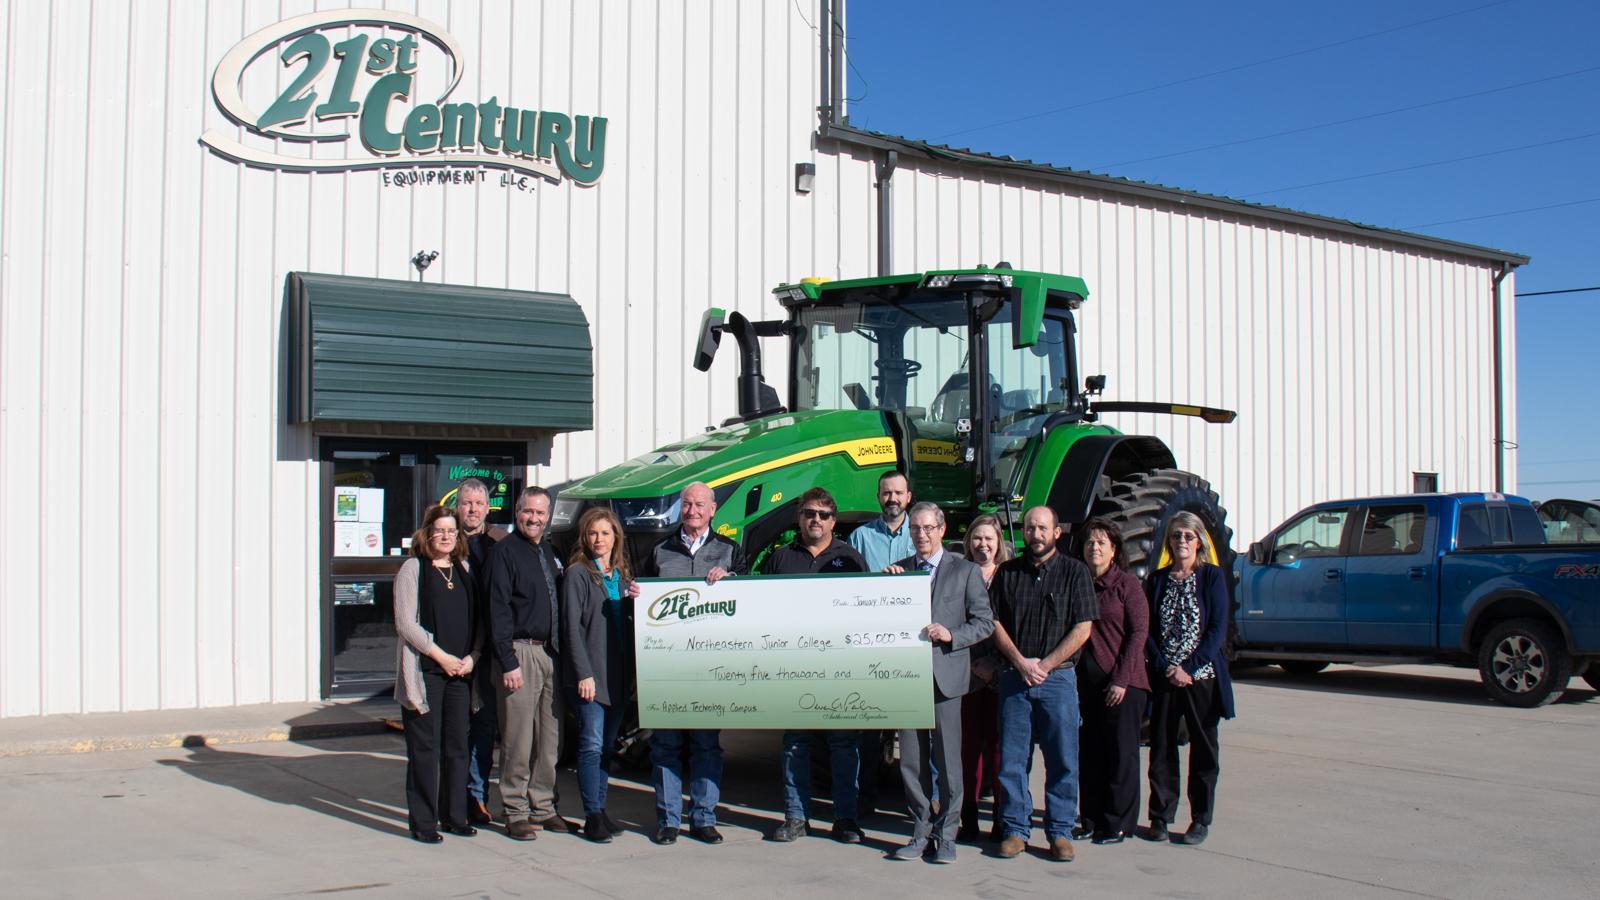 21st Century Equipment $25,000 donation to Northeastern